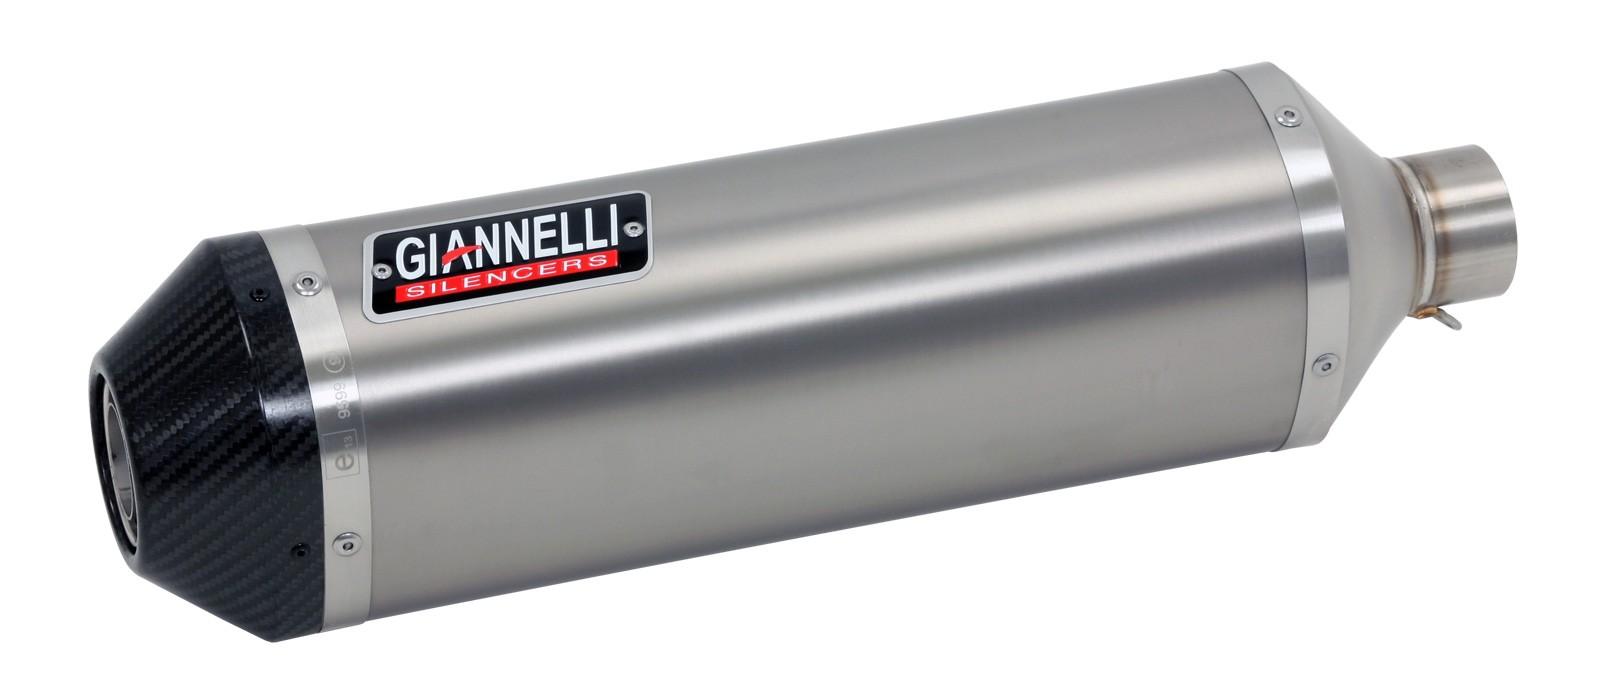 ESCAPES GIANNELLI YAMAHA - Sistema completo IPERSPORT Silenciador aluminio versión Black Line (colectores racing) Yamaha